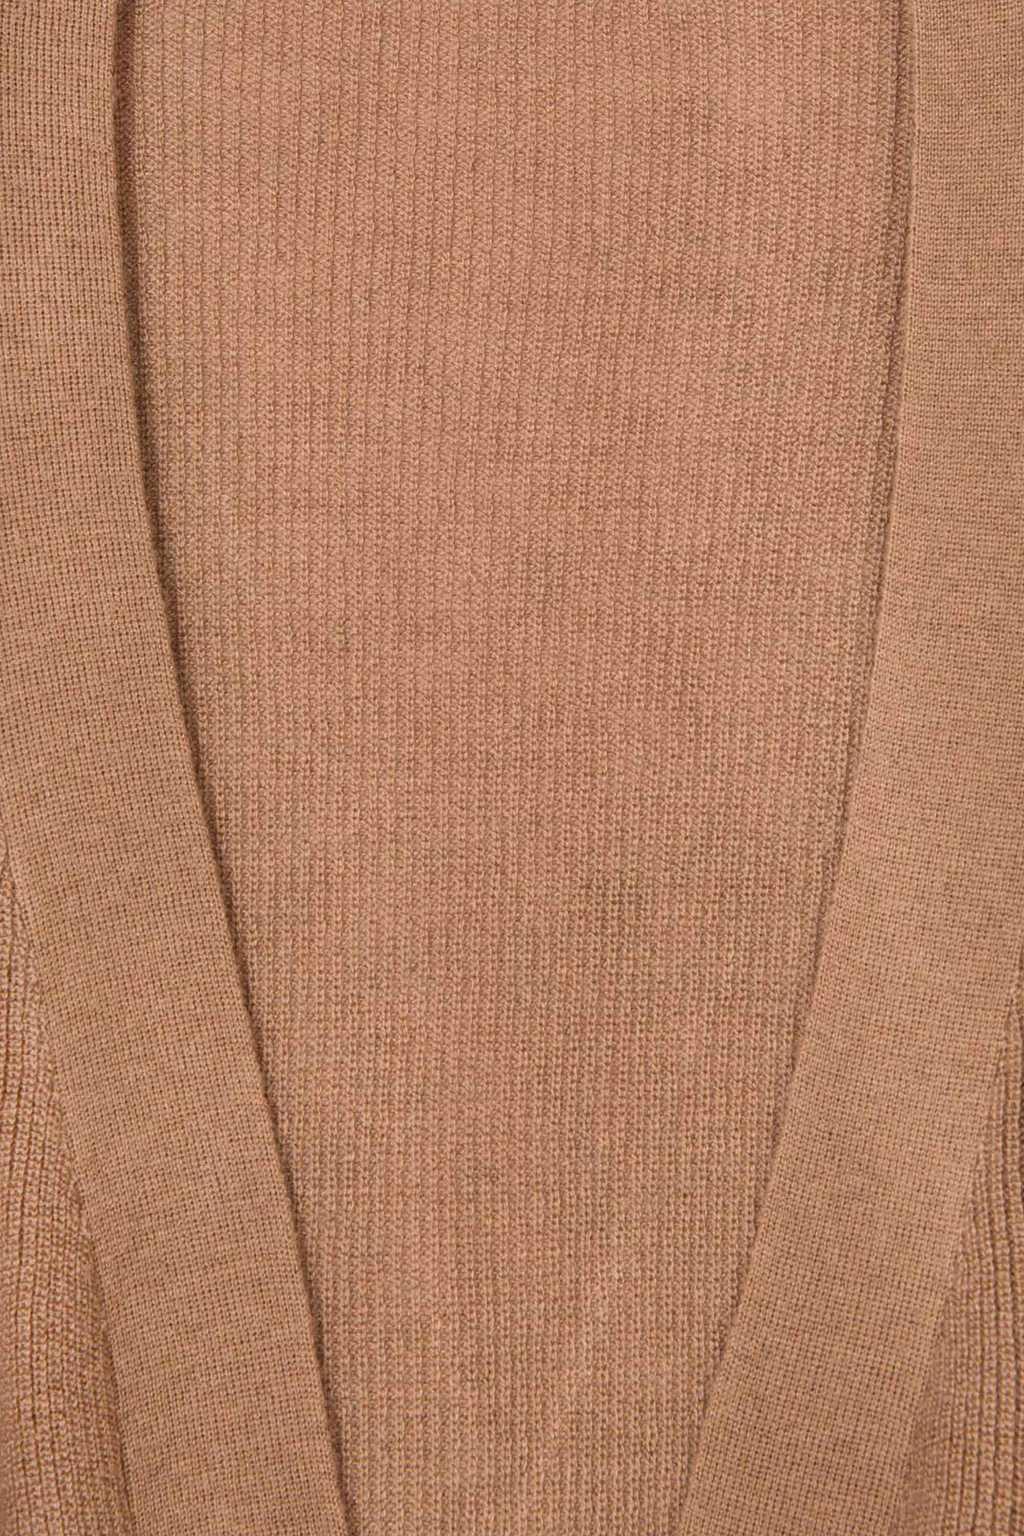 Cardigan 2320 Olive 6